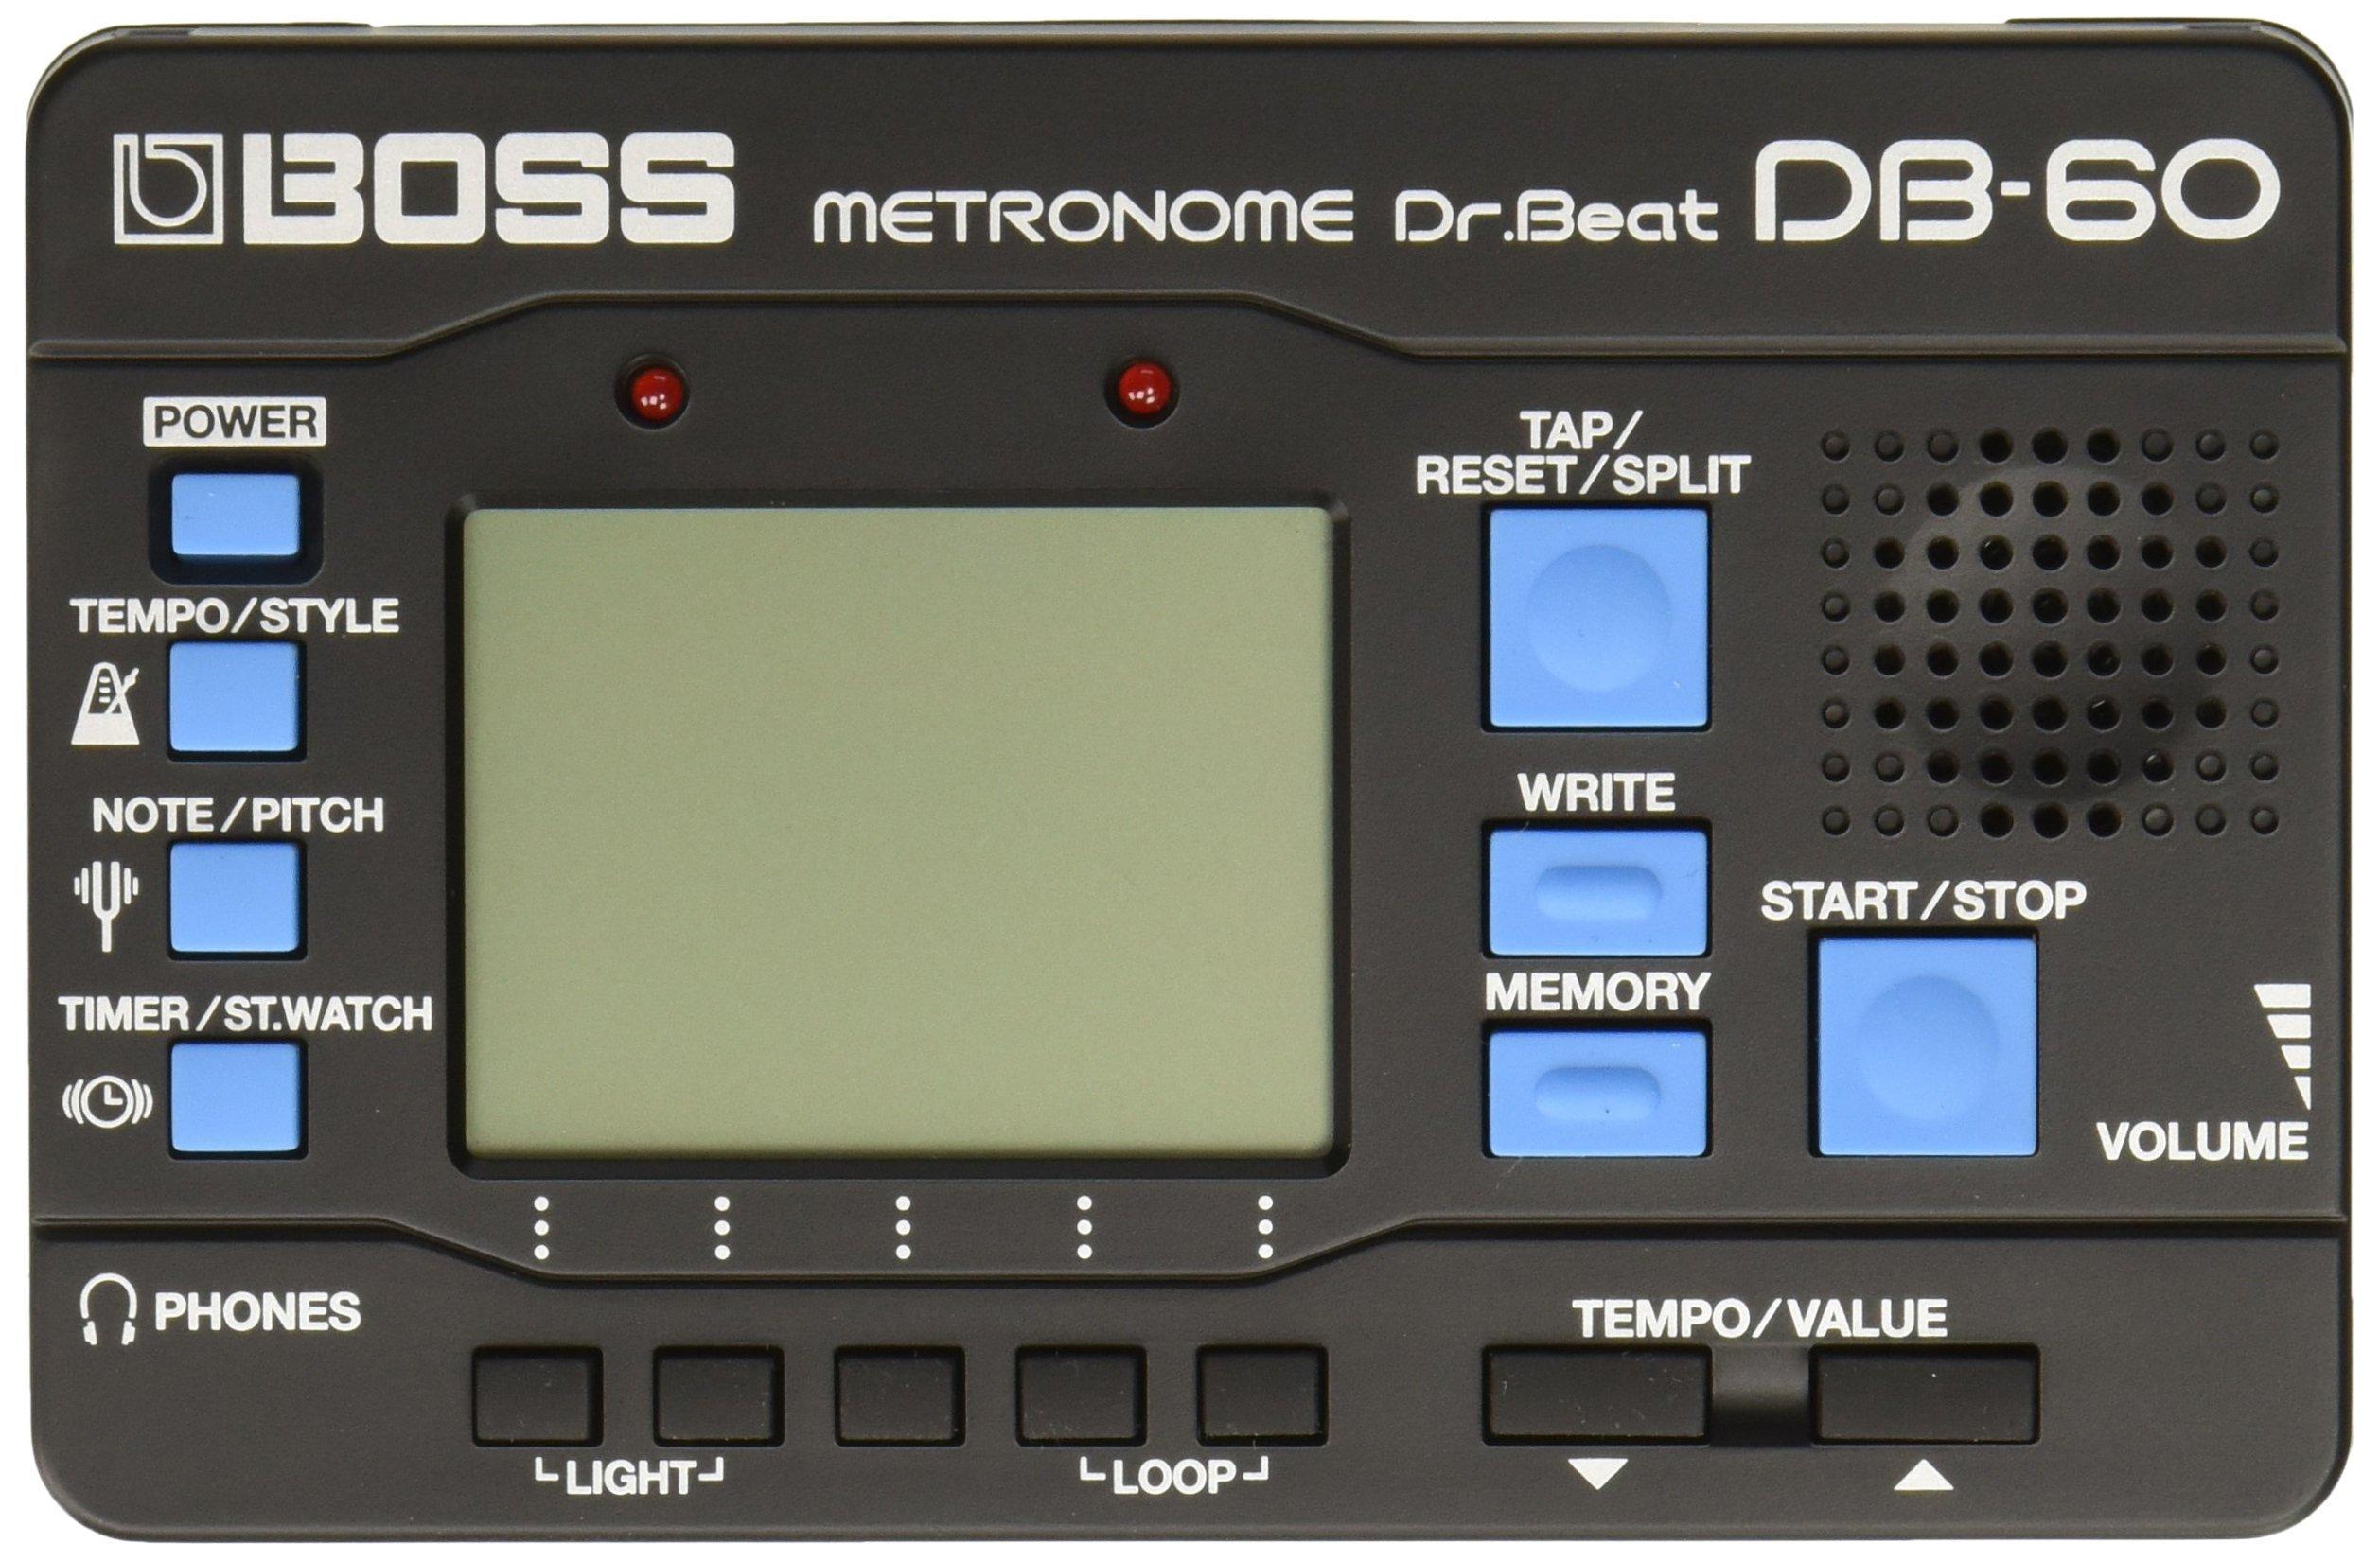 BOSS DB-60 Metronome